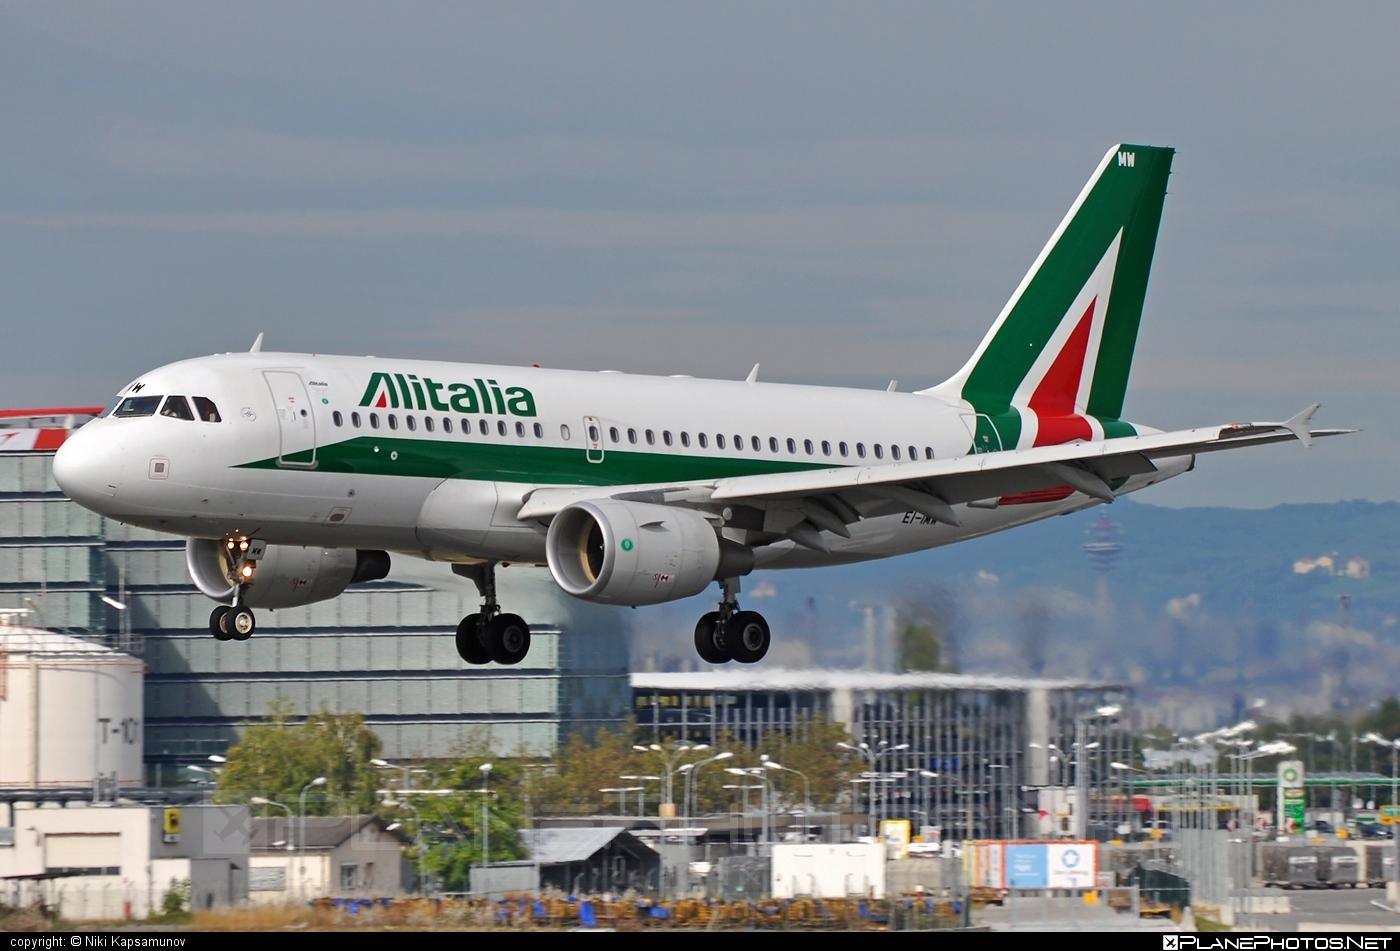 Airbus A319-111 - EI-IMW operated by Alitalia #a319 #a320family #airbus #airbus319 #alitalia